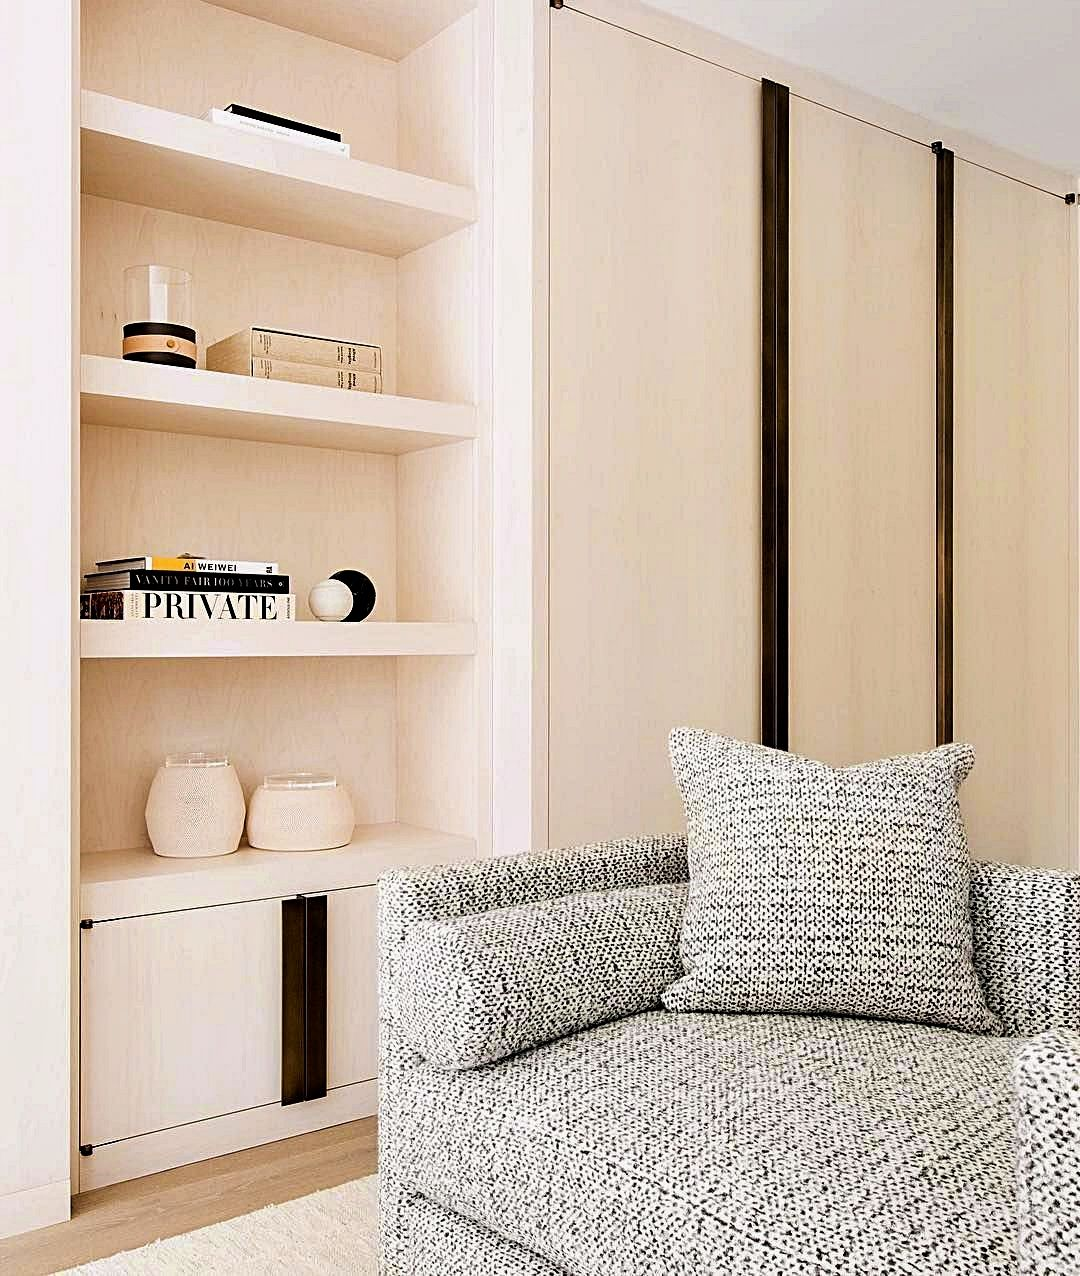 Living Room Design Hacks, The Mirror Will Reflect Light